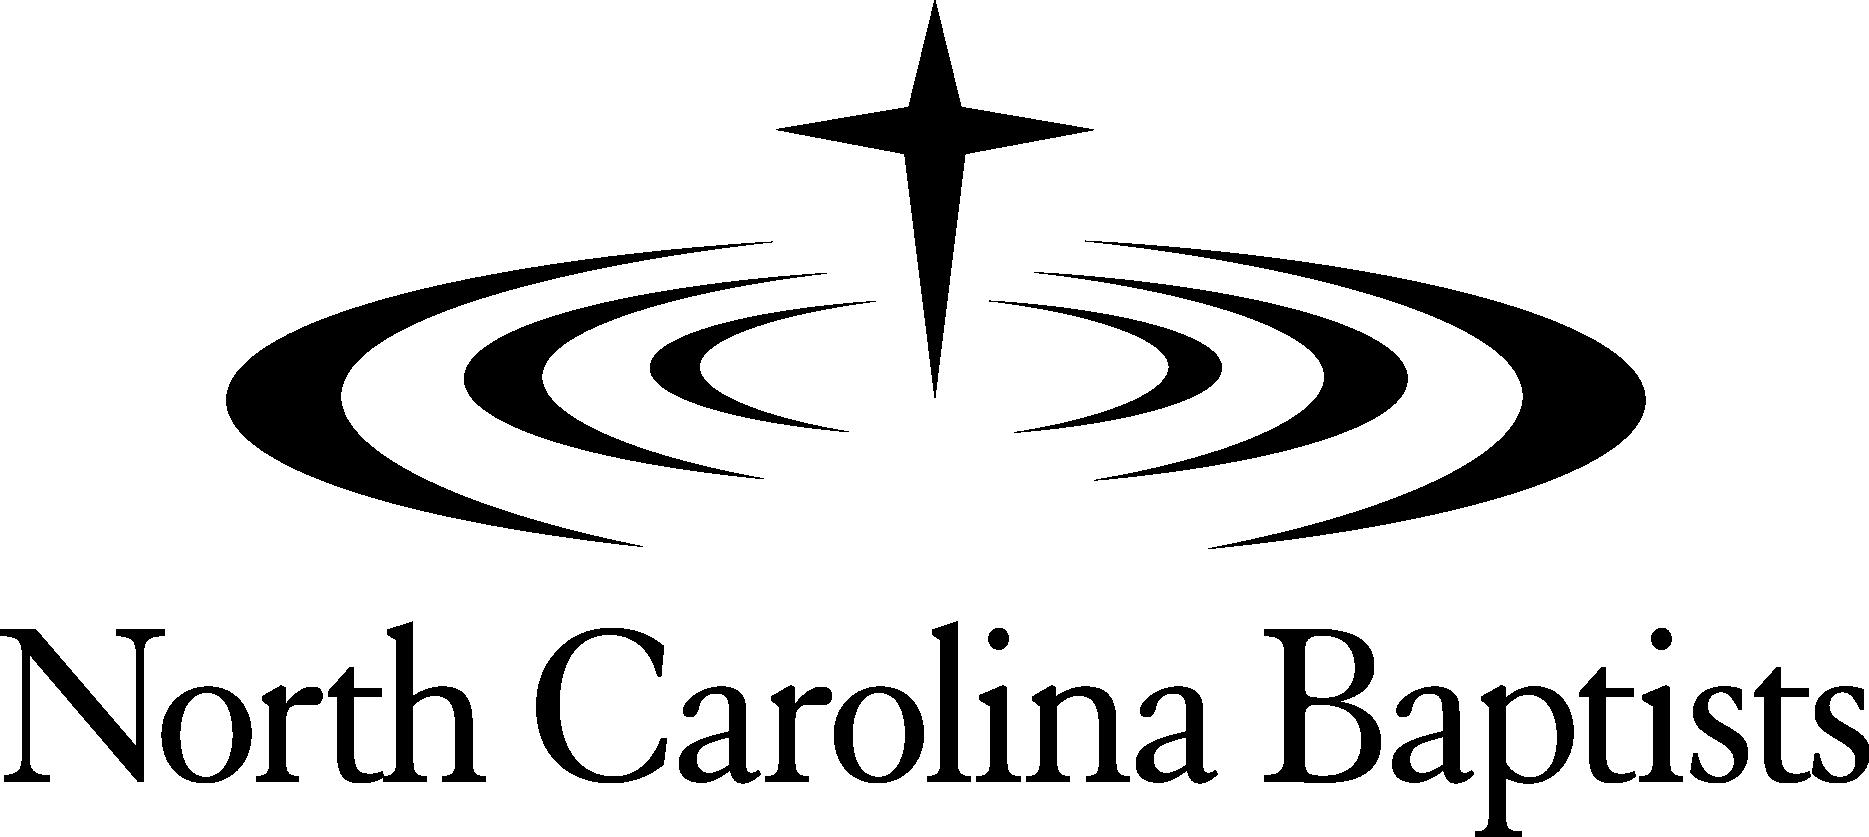 BSC Logo_black.png